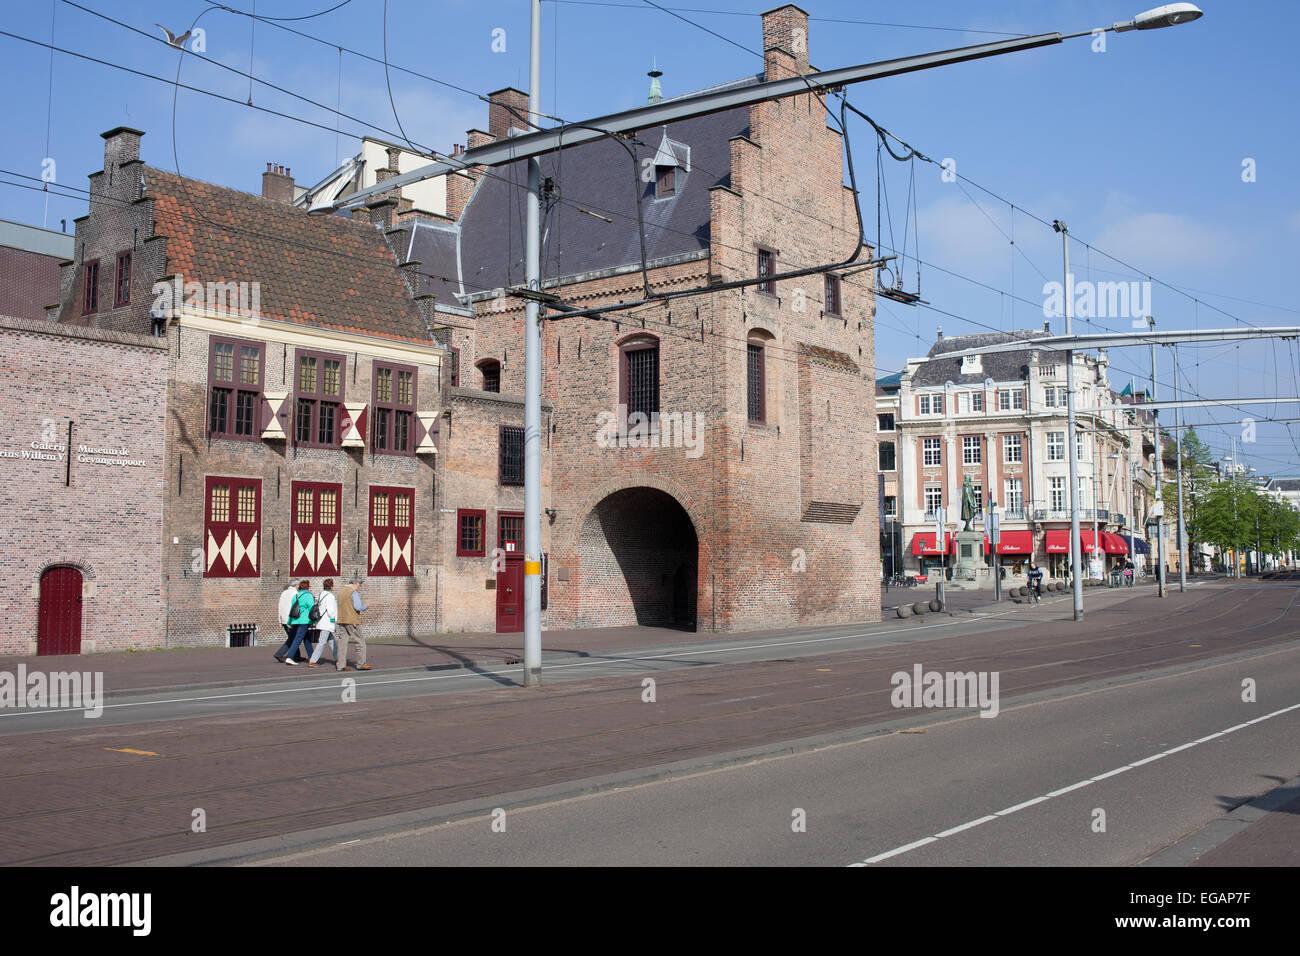 Prison Gate Museum on Buitenhof, city of Hague (Den Haag), Holland, Netherlands. - Stock Image